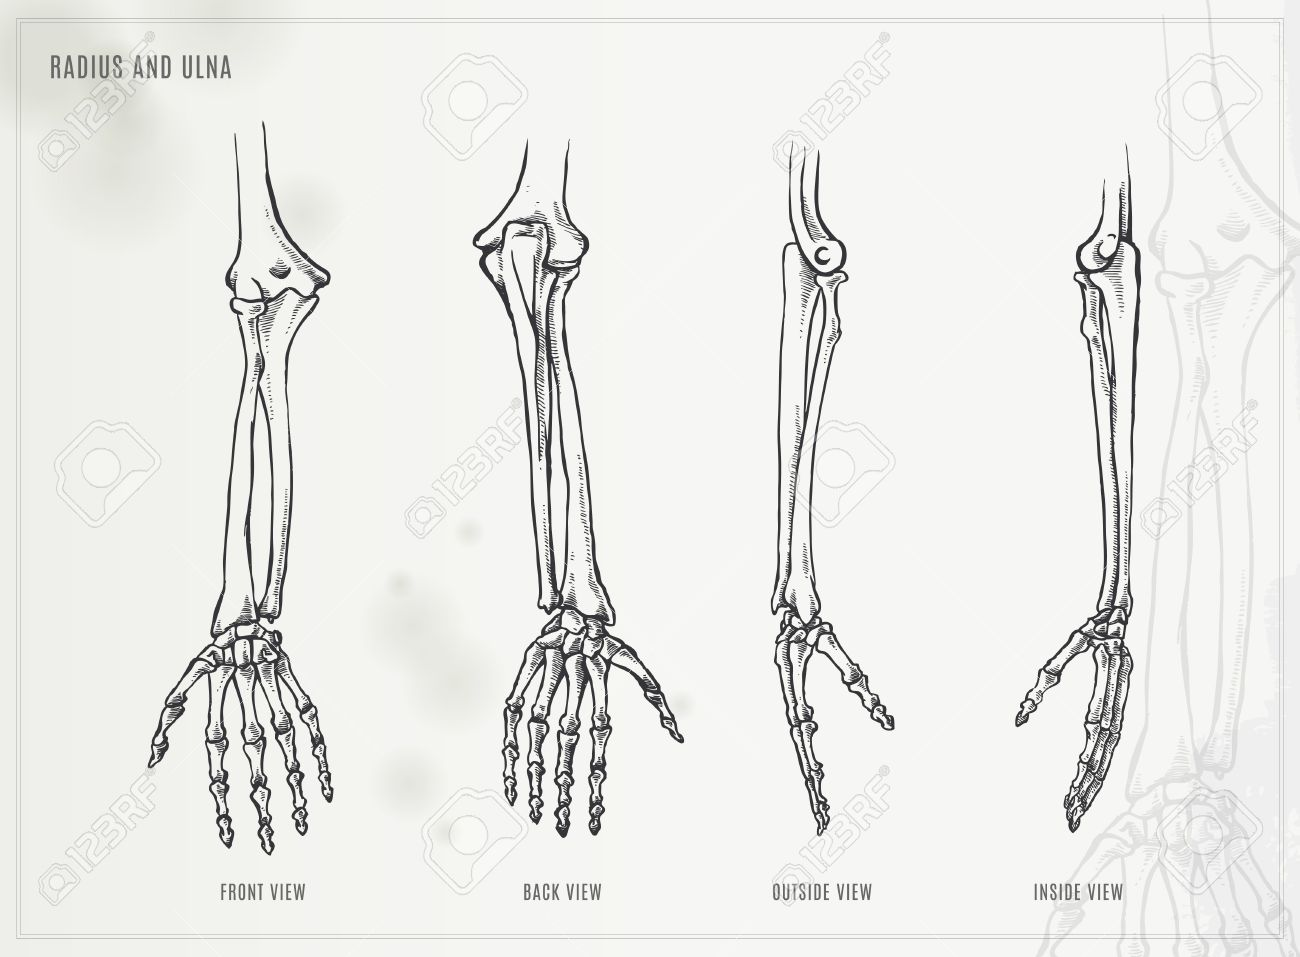 Ulna, Radius And Hand Bones Royalty Free Cliparts, Vectors, And ...